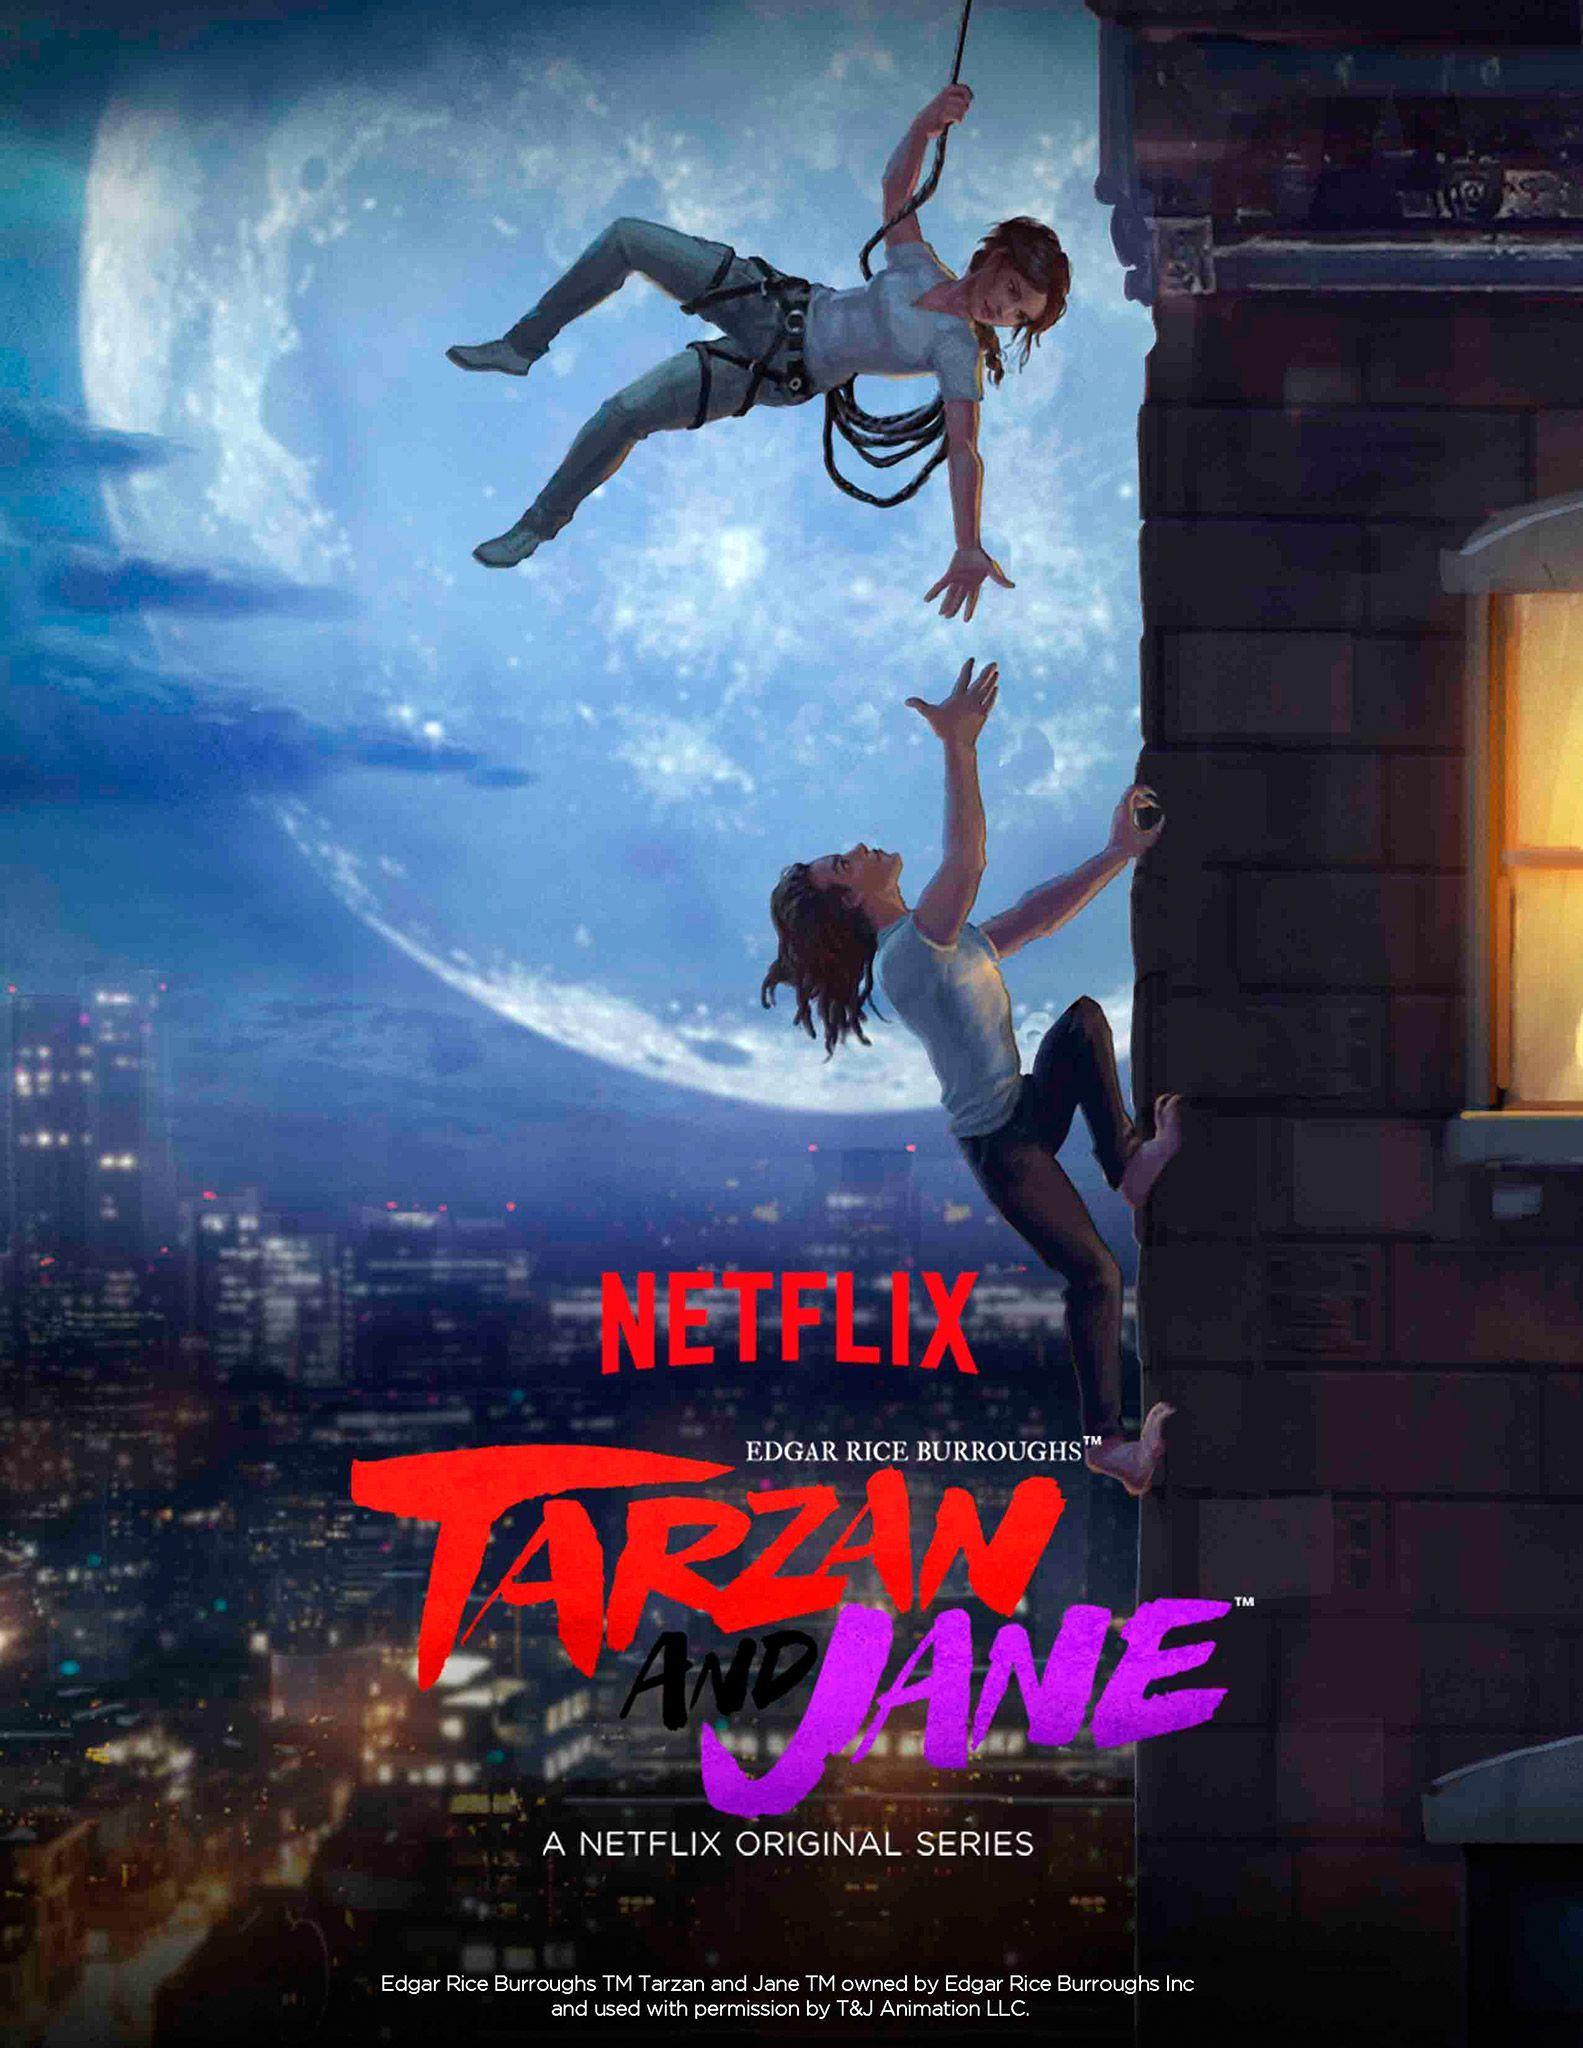 Netflix Is Going To Make January So Much Better Tarzan